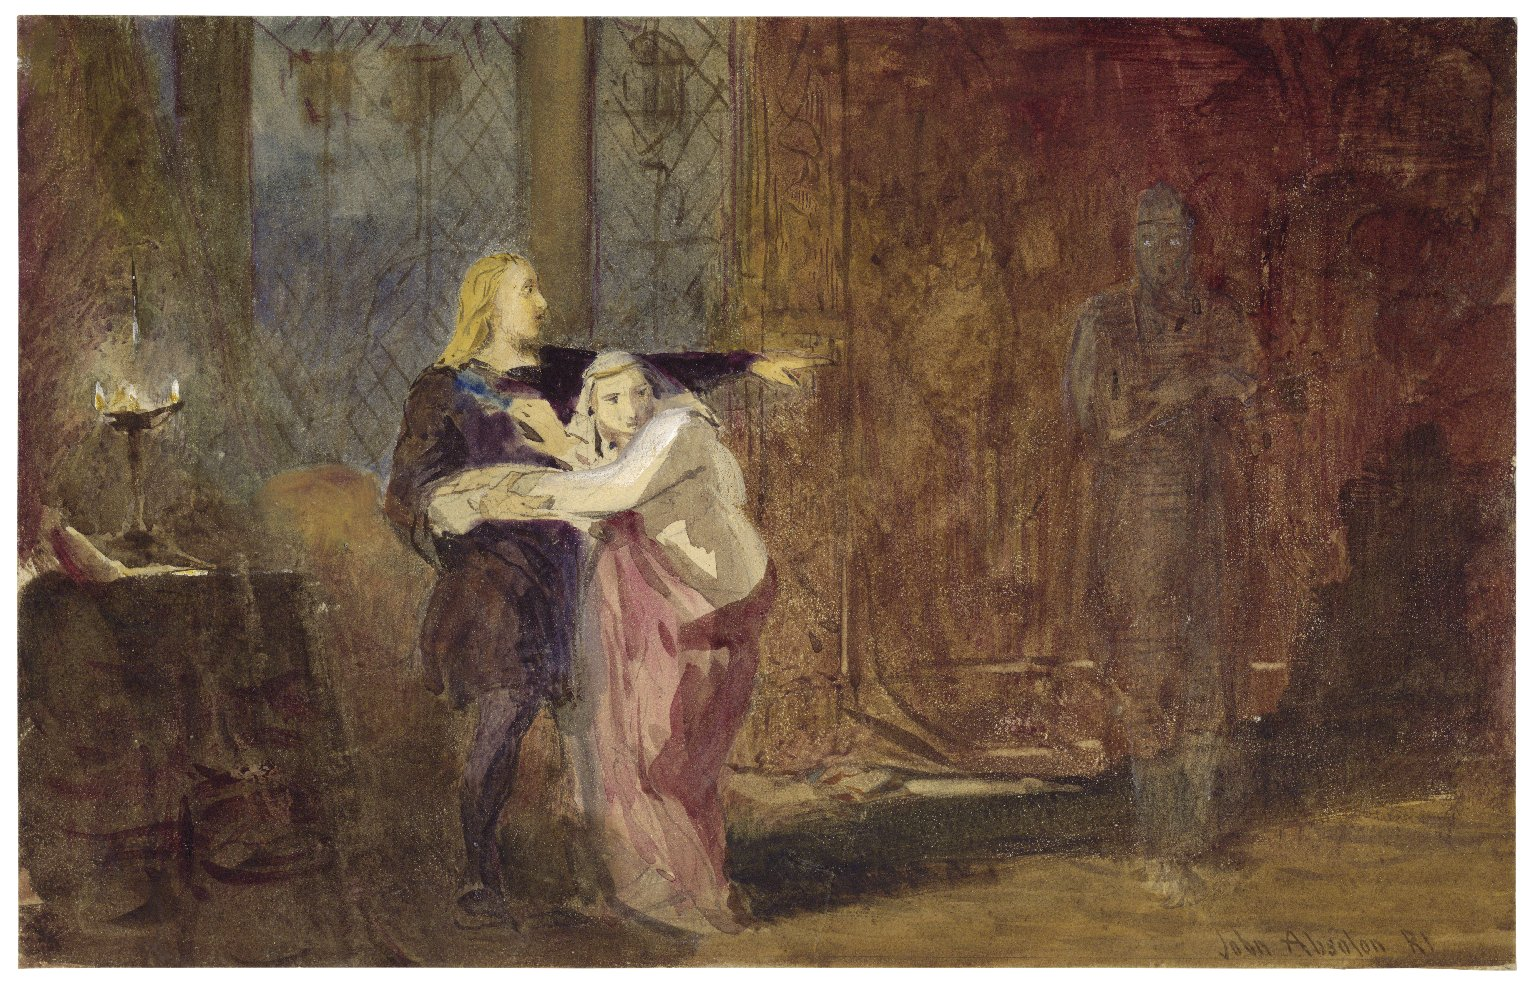 [Mr. Edmund Kean as Hamlet] [graphic] / John Absolon R.I.